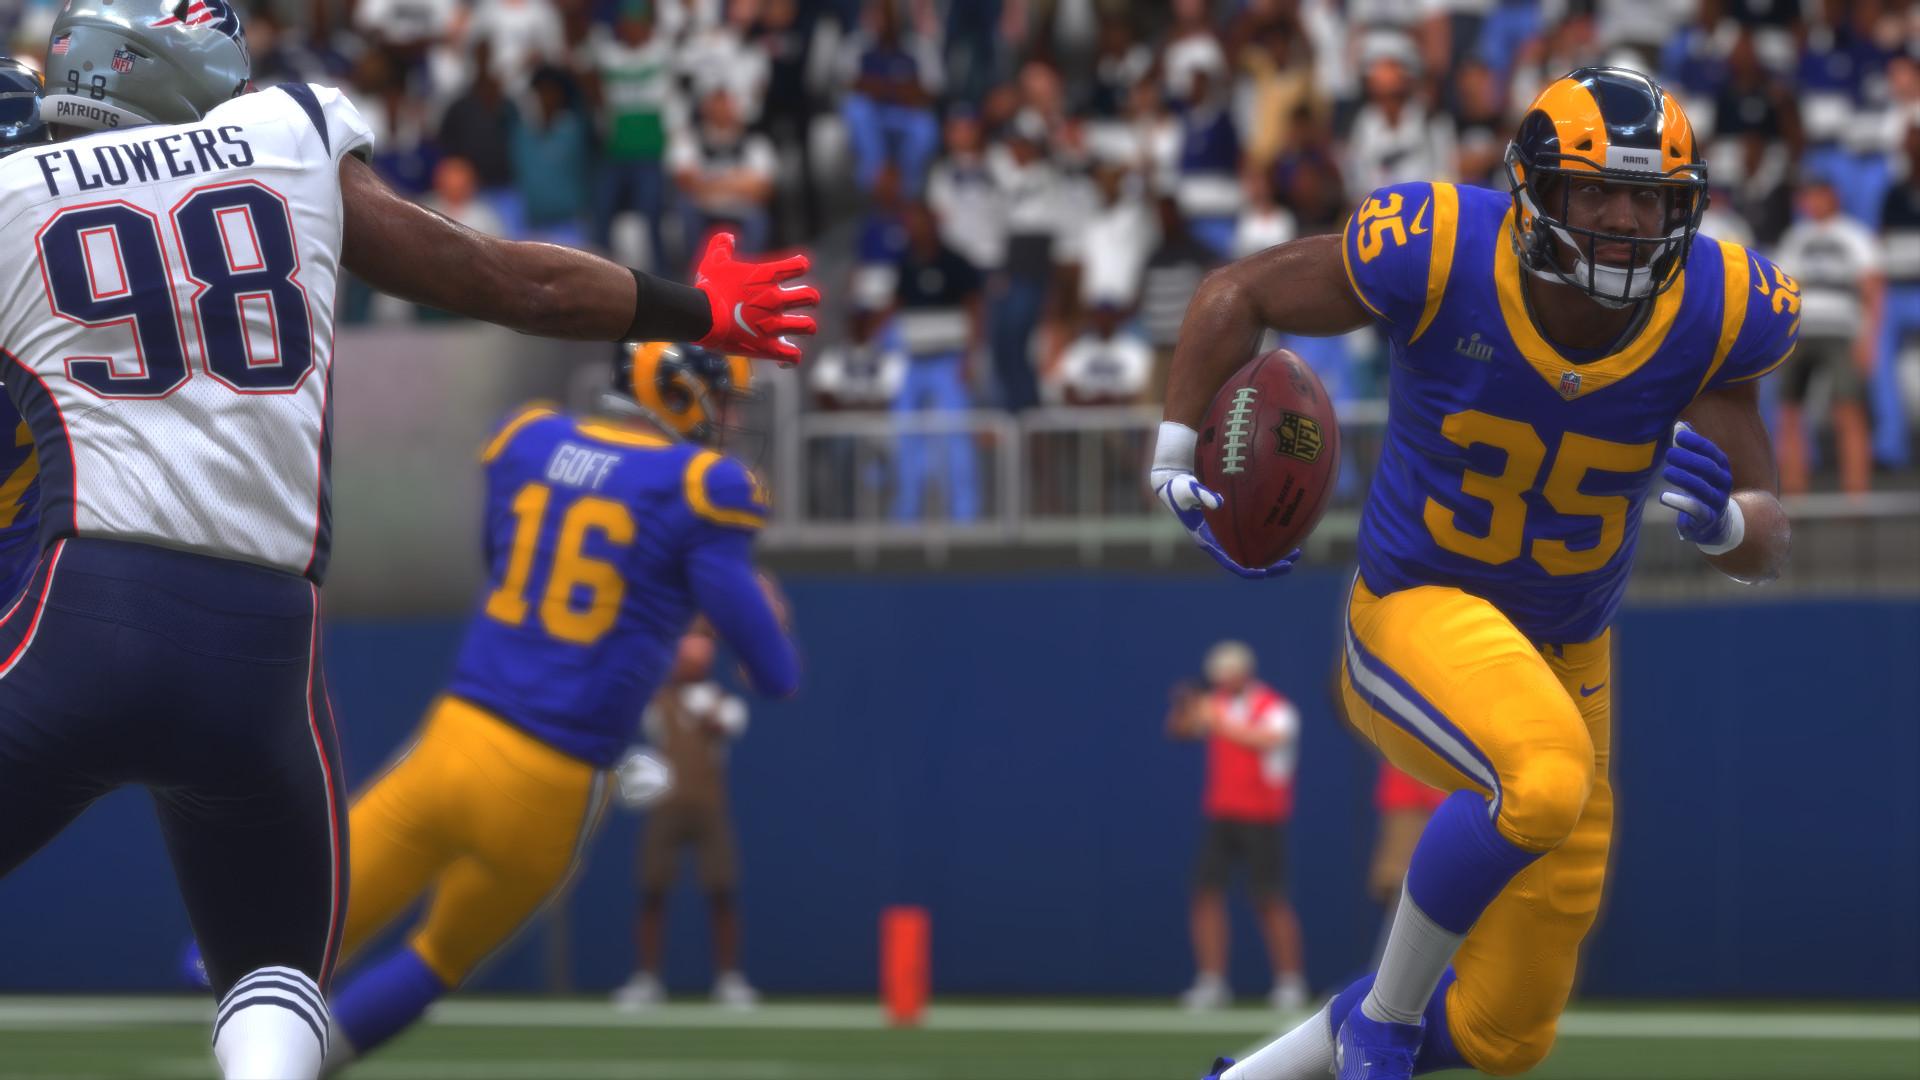 Madden NFL 19 Super Bowl LII CJ Anderson